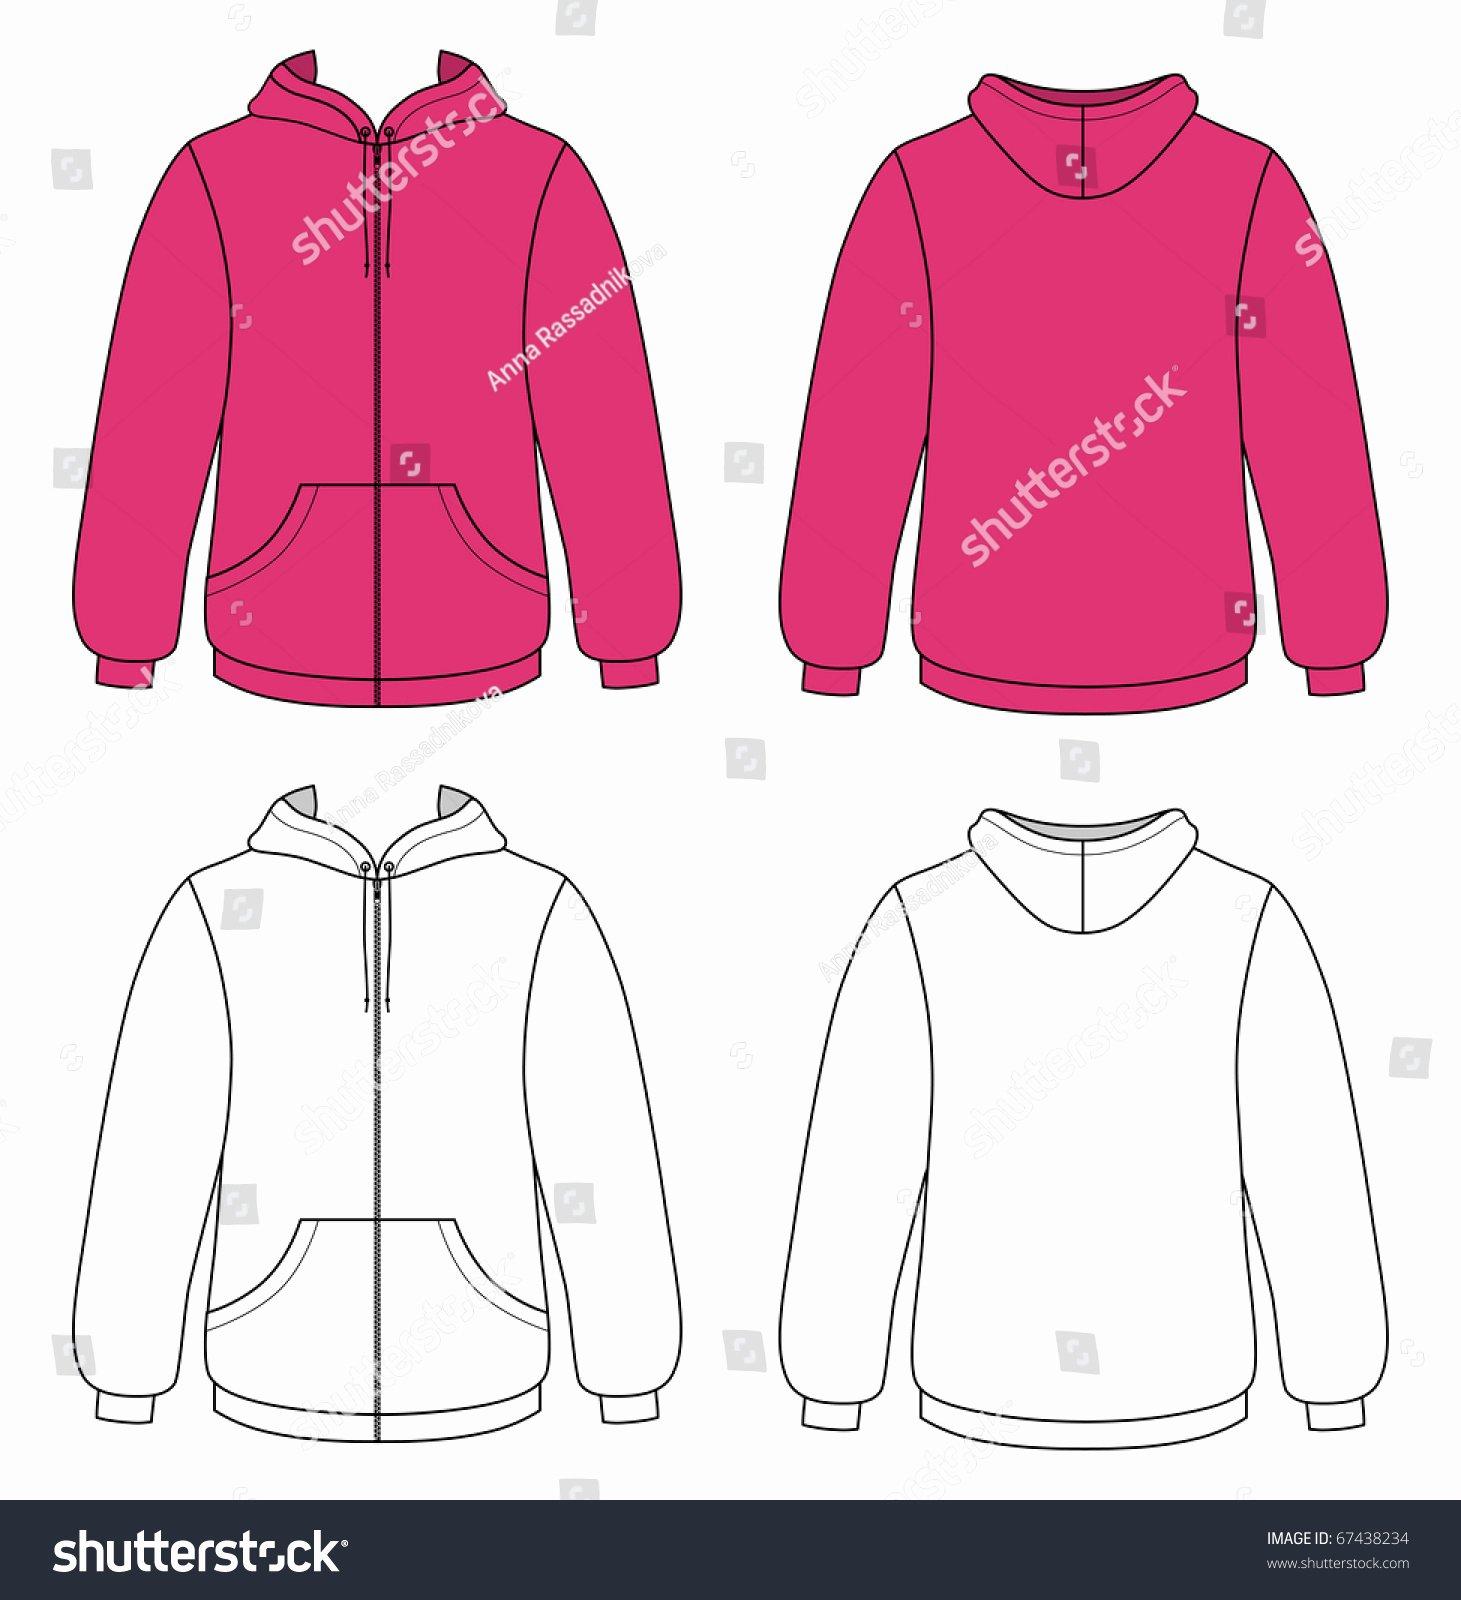 Hooded Sweatshirt Template Elegant Template Outline Illustration Blank Hooded Sweater Stock